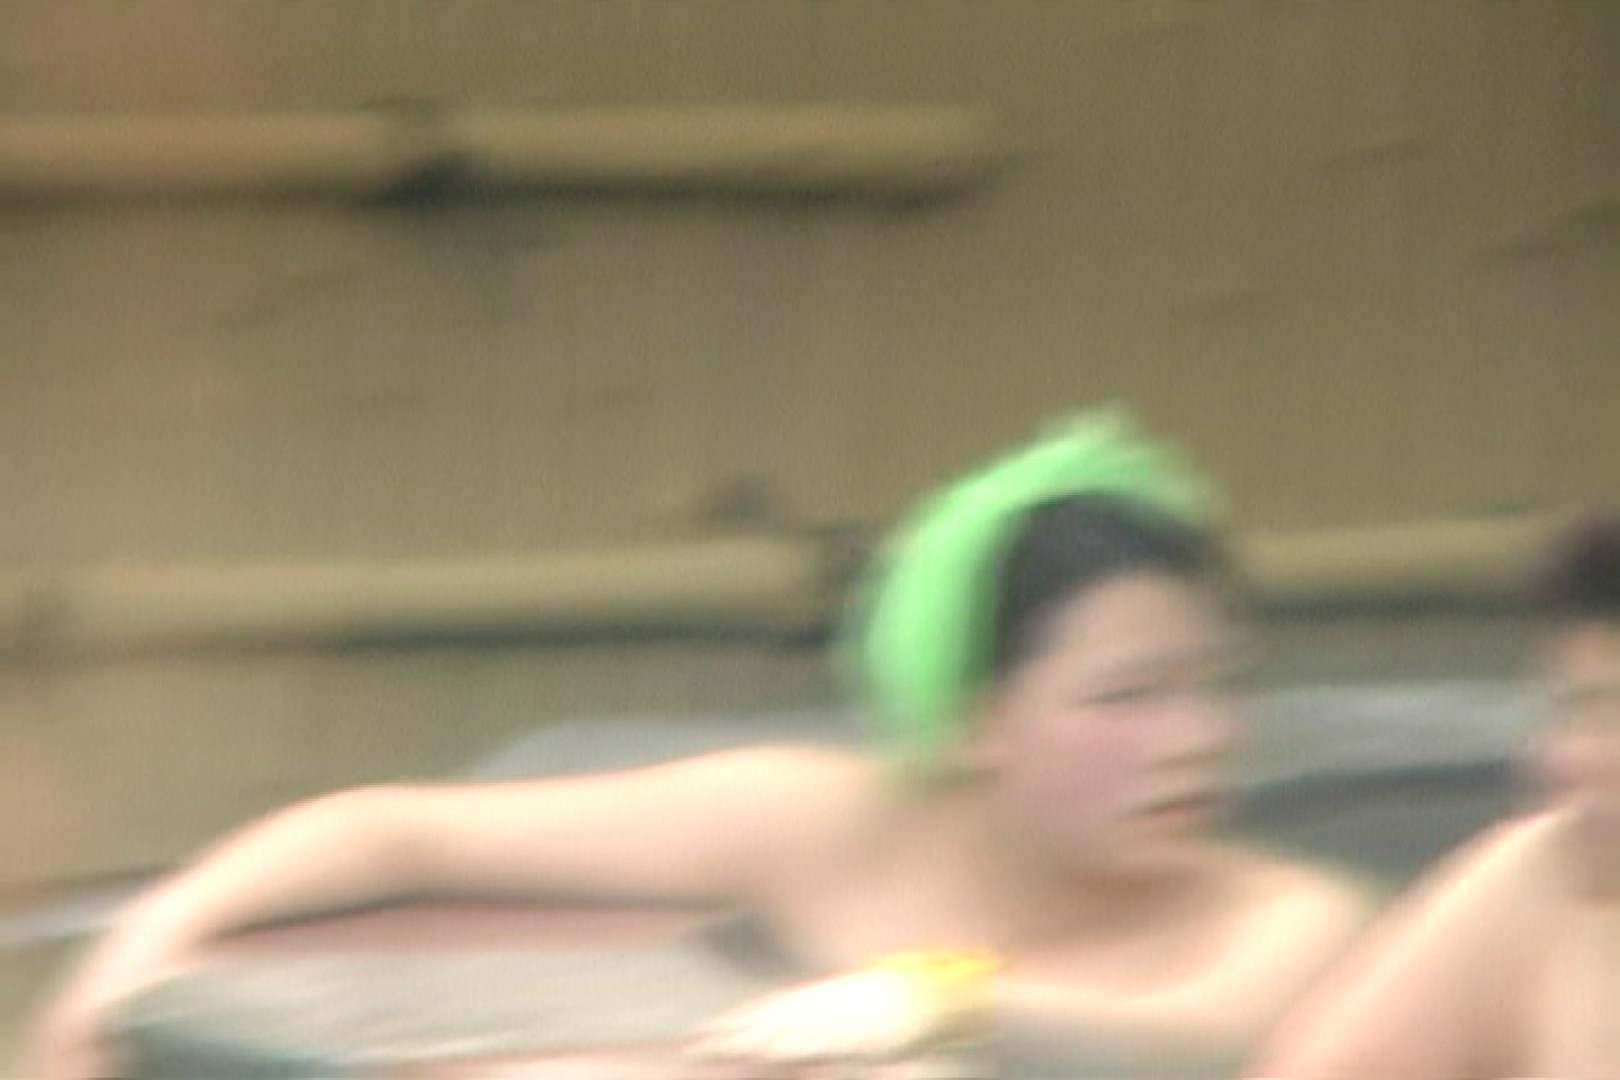 Aquaな露天風呂Vol.563 OLセックス 盗撮動画紹介 92画像 29